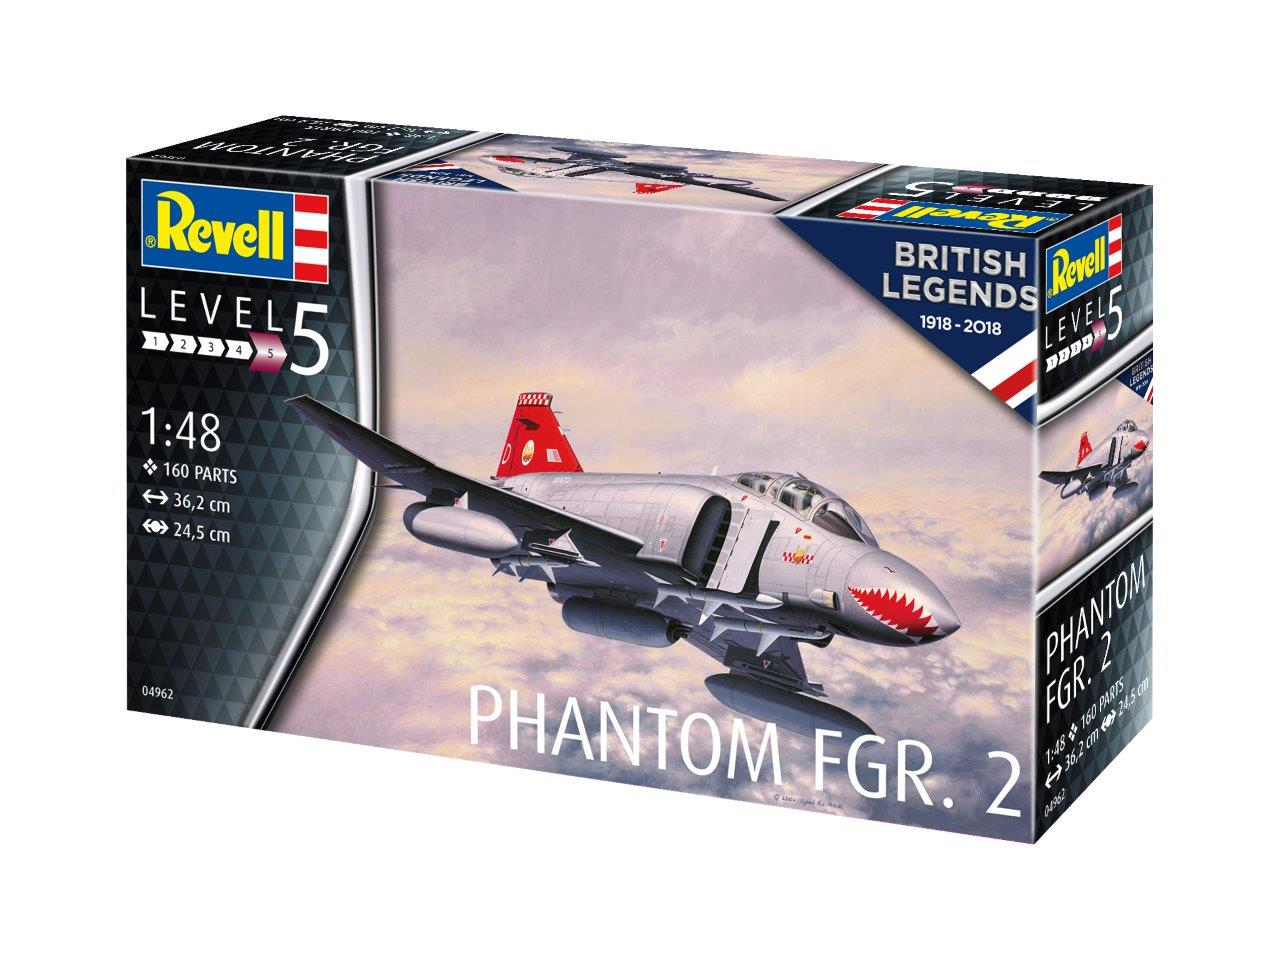 lightning Harrier Nouveau MODELDECAL 94 1:72 Raf McDonnell-Douglas FGR.2 Phantom